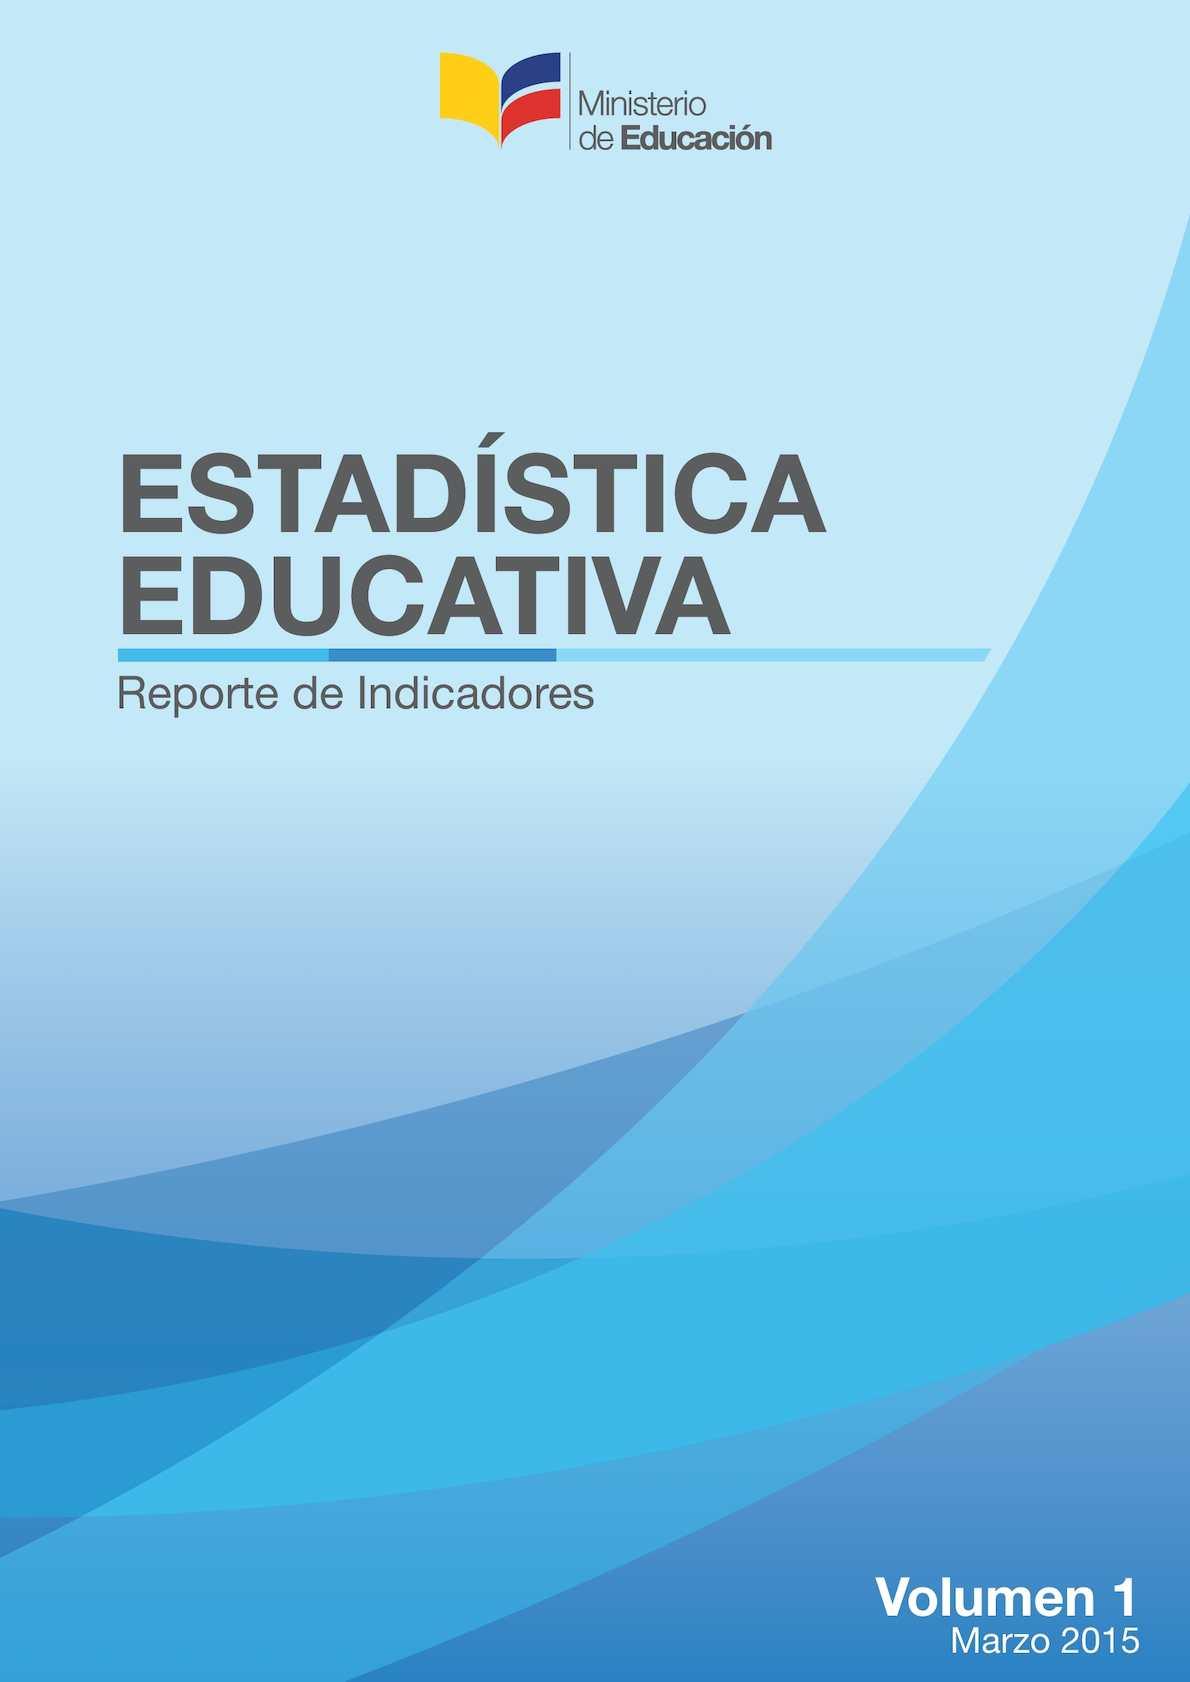 Estadística Educativa Vol 1